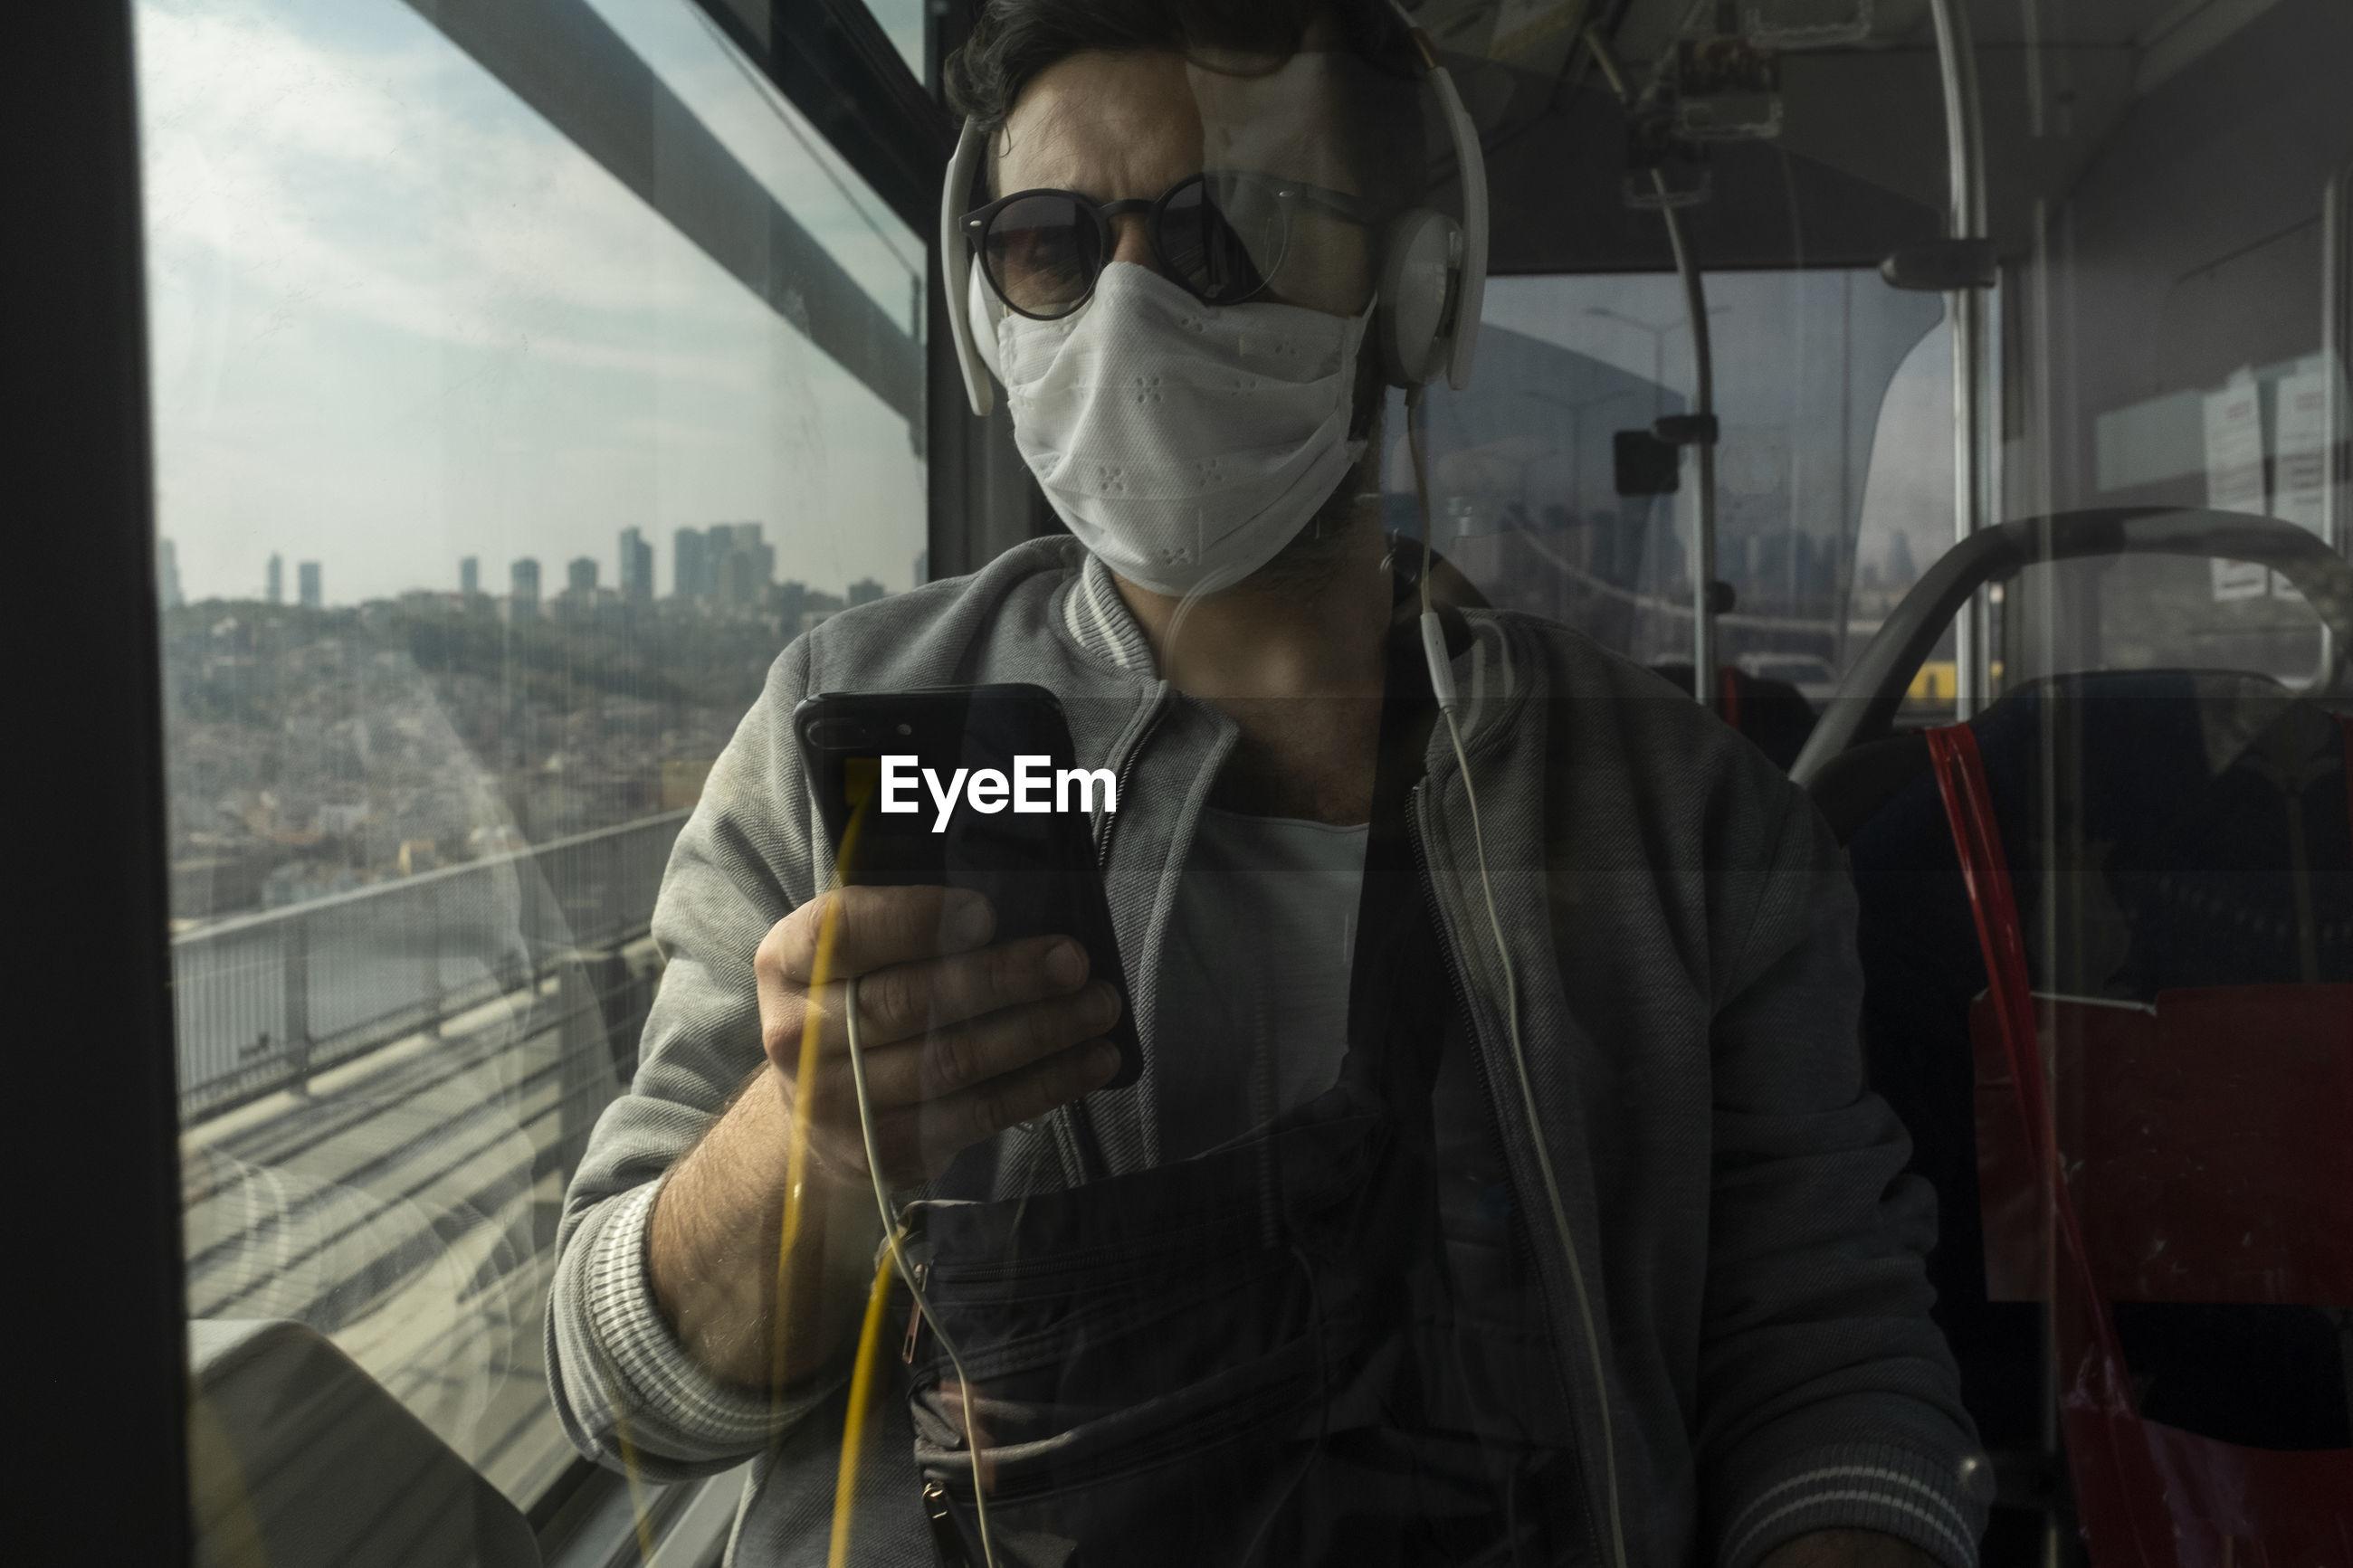 Man using mobile phone in train seen through window